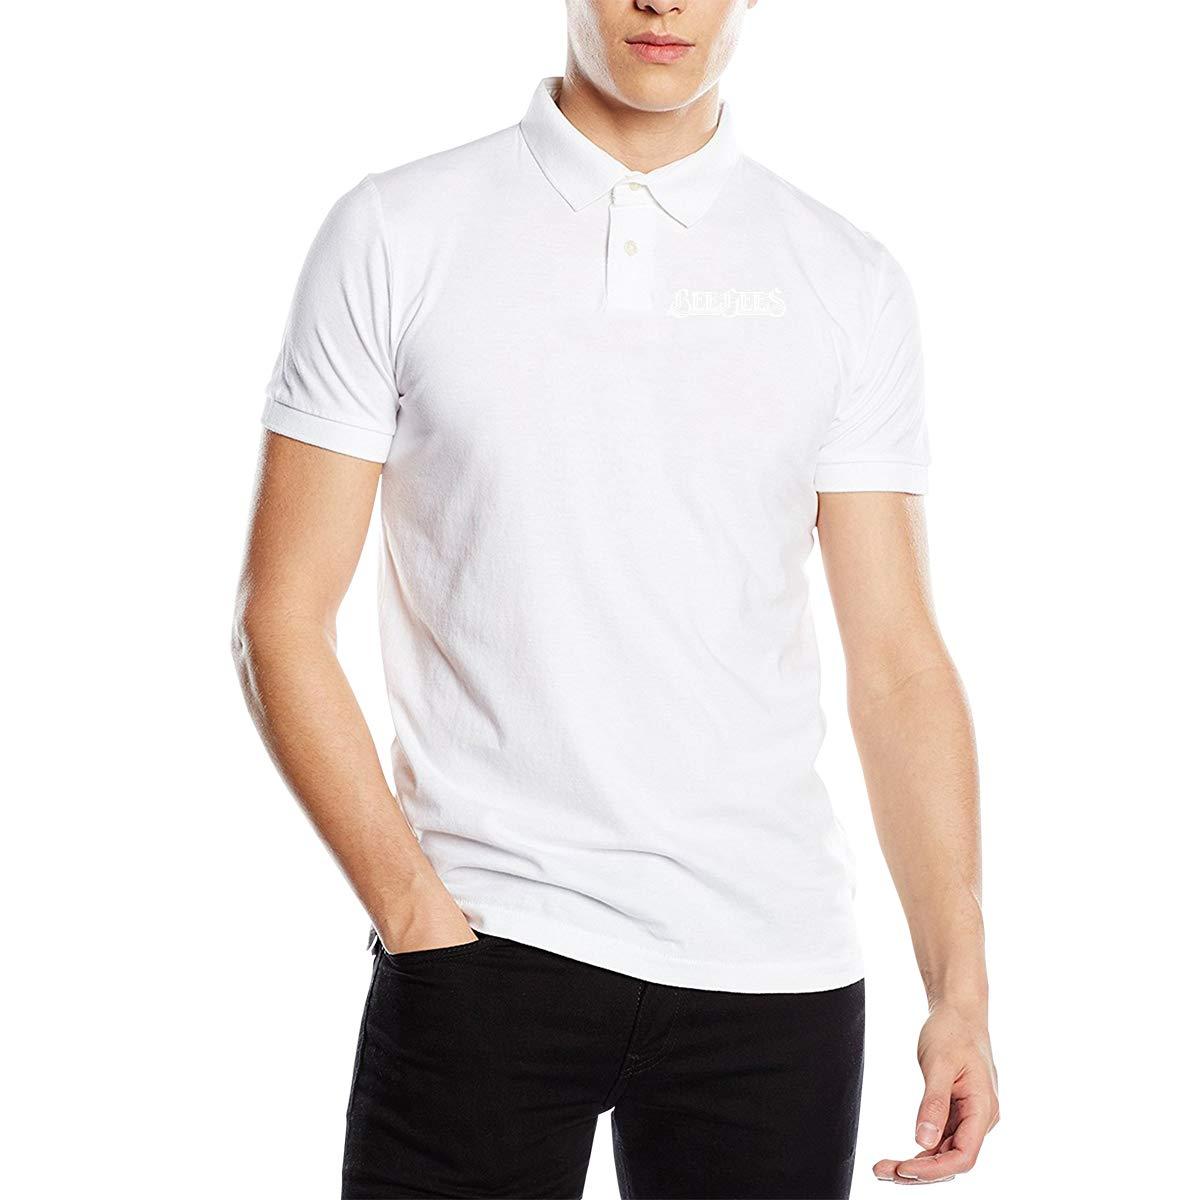 Arilce Bee-Gees Men Polo Shirt Short Sleeve Lapel Blouse Black